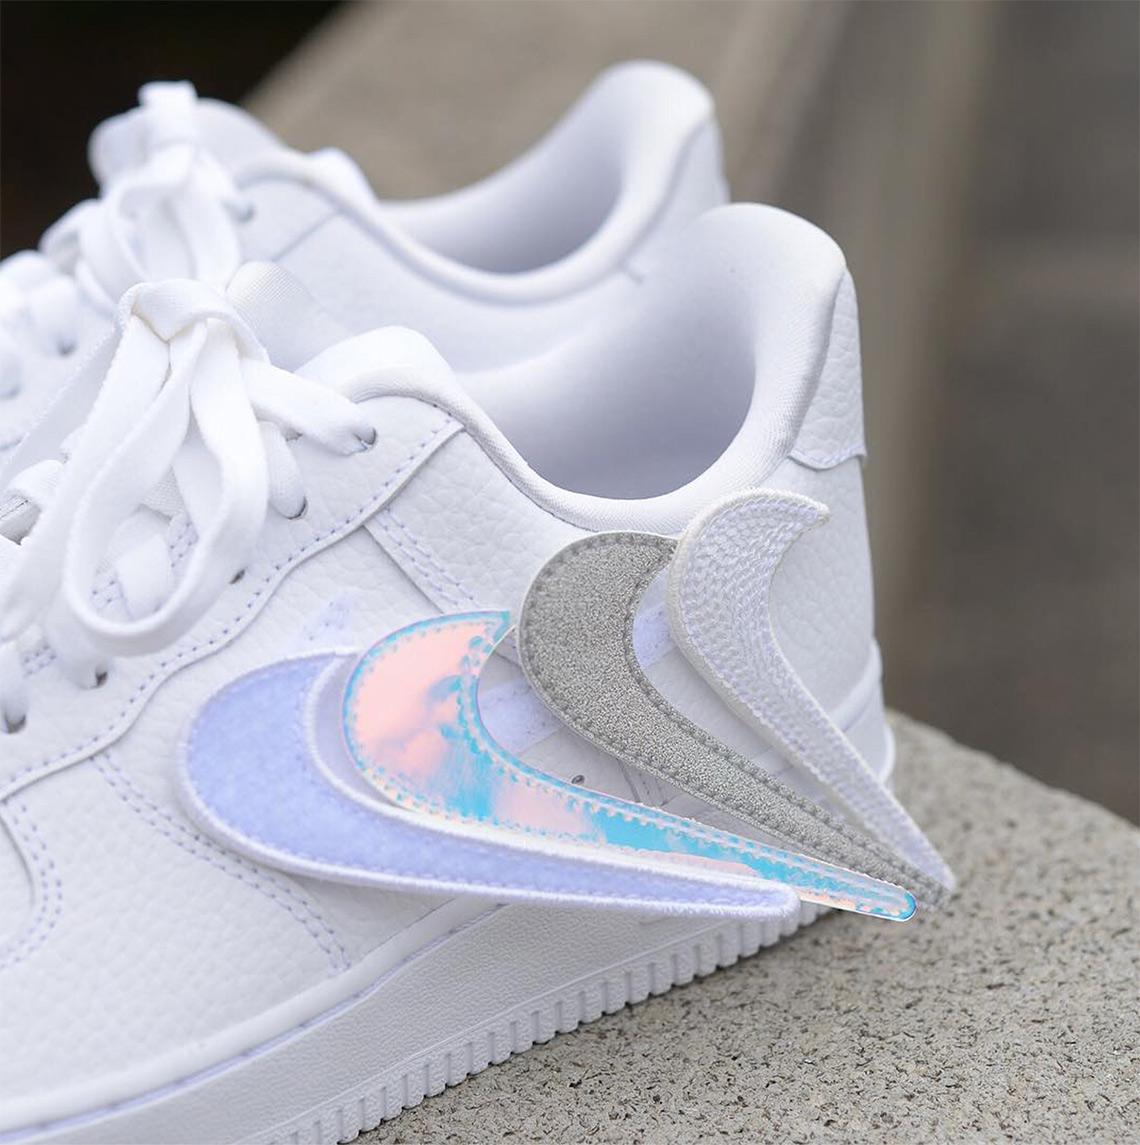 Nike Air Force 1 100 Aq3621 111 Sneakernews Com